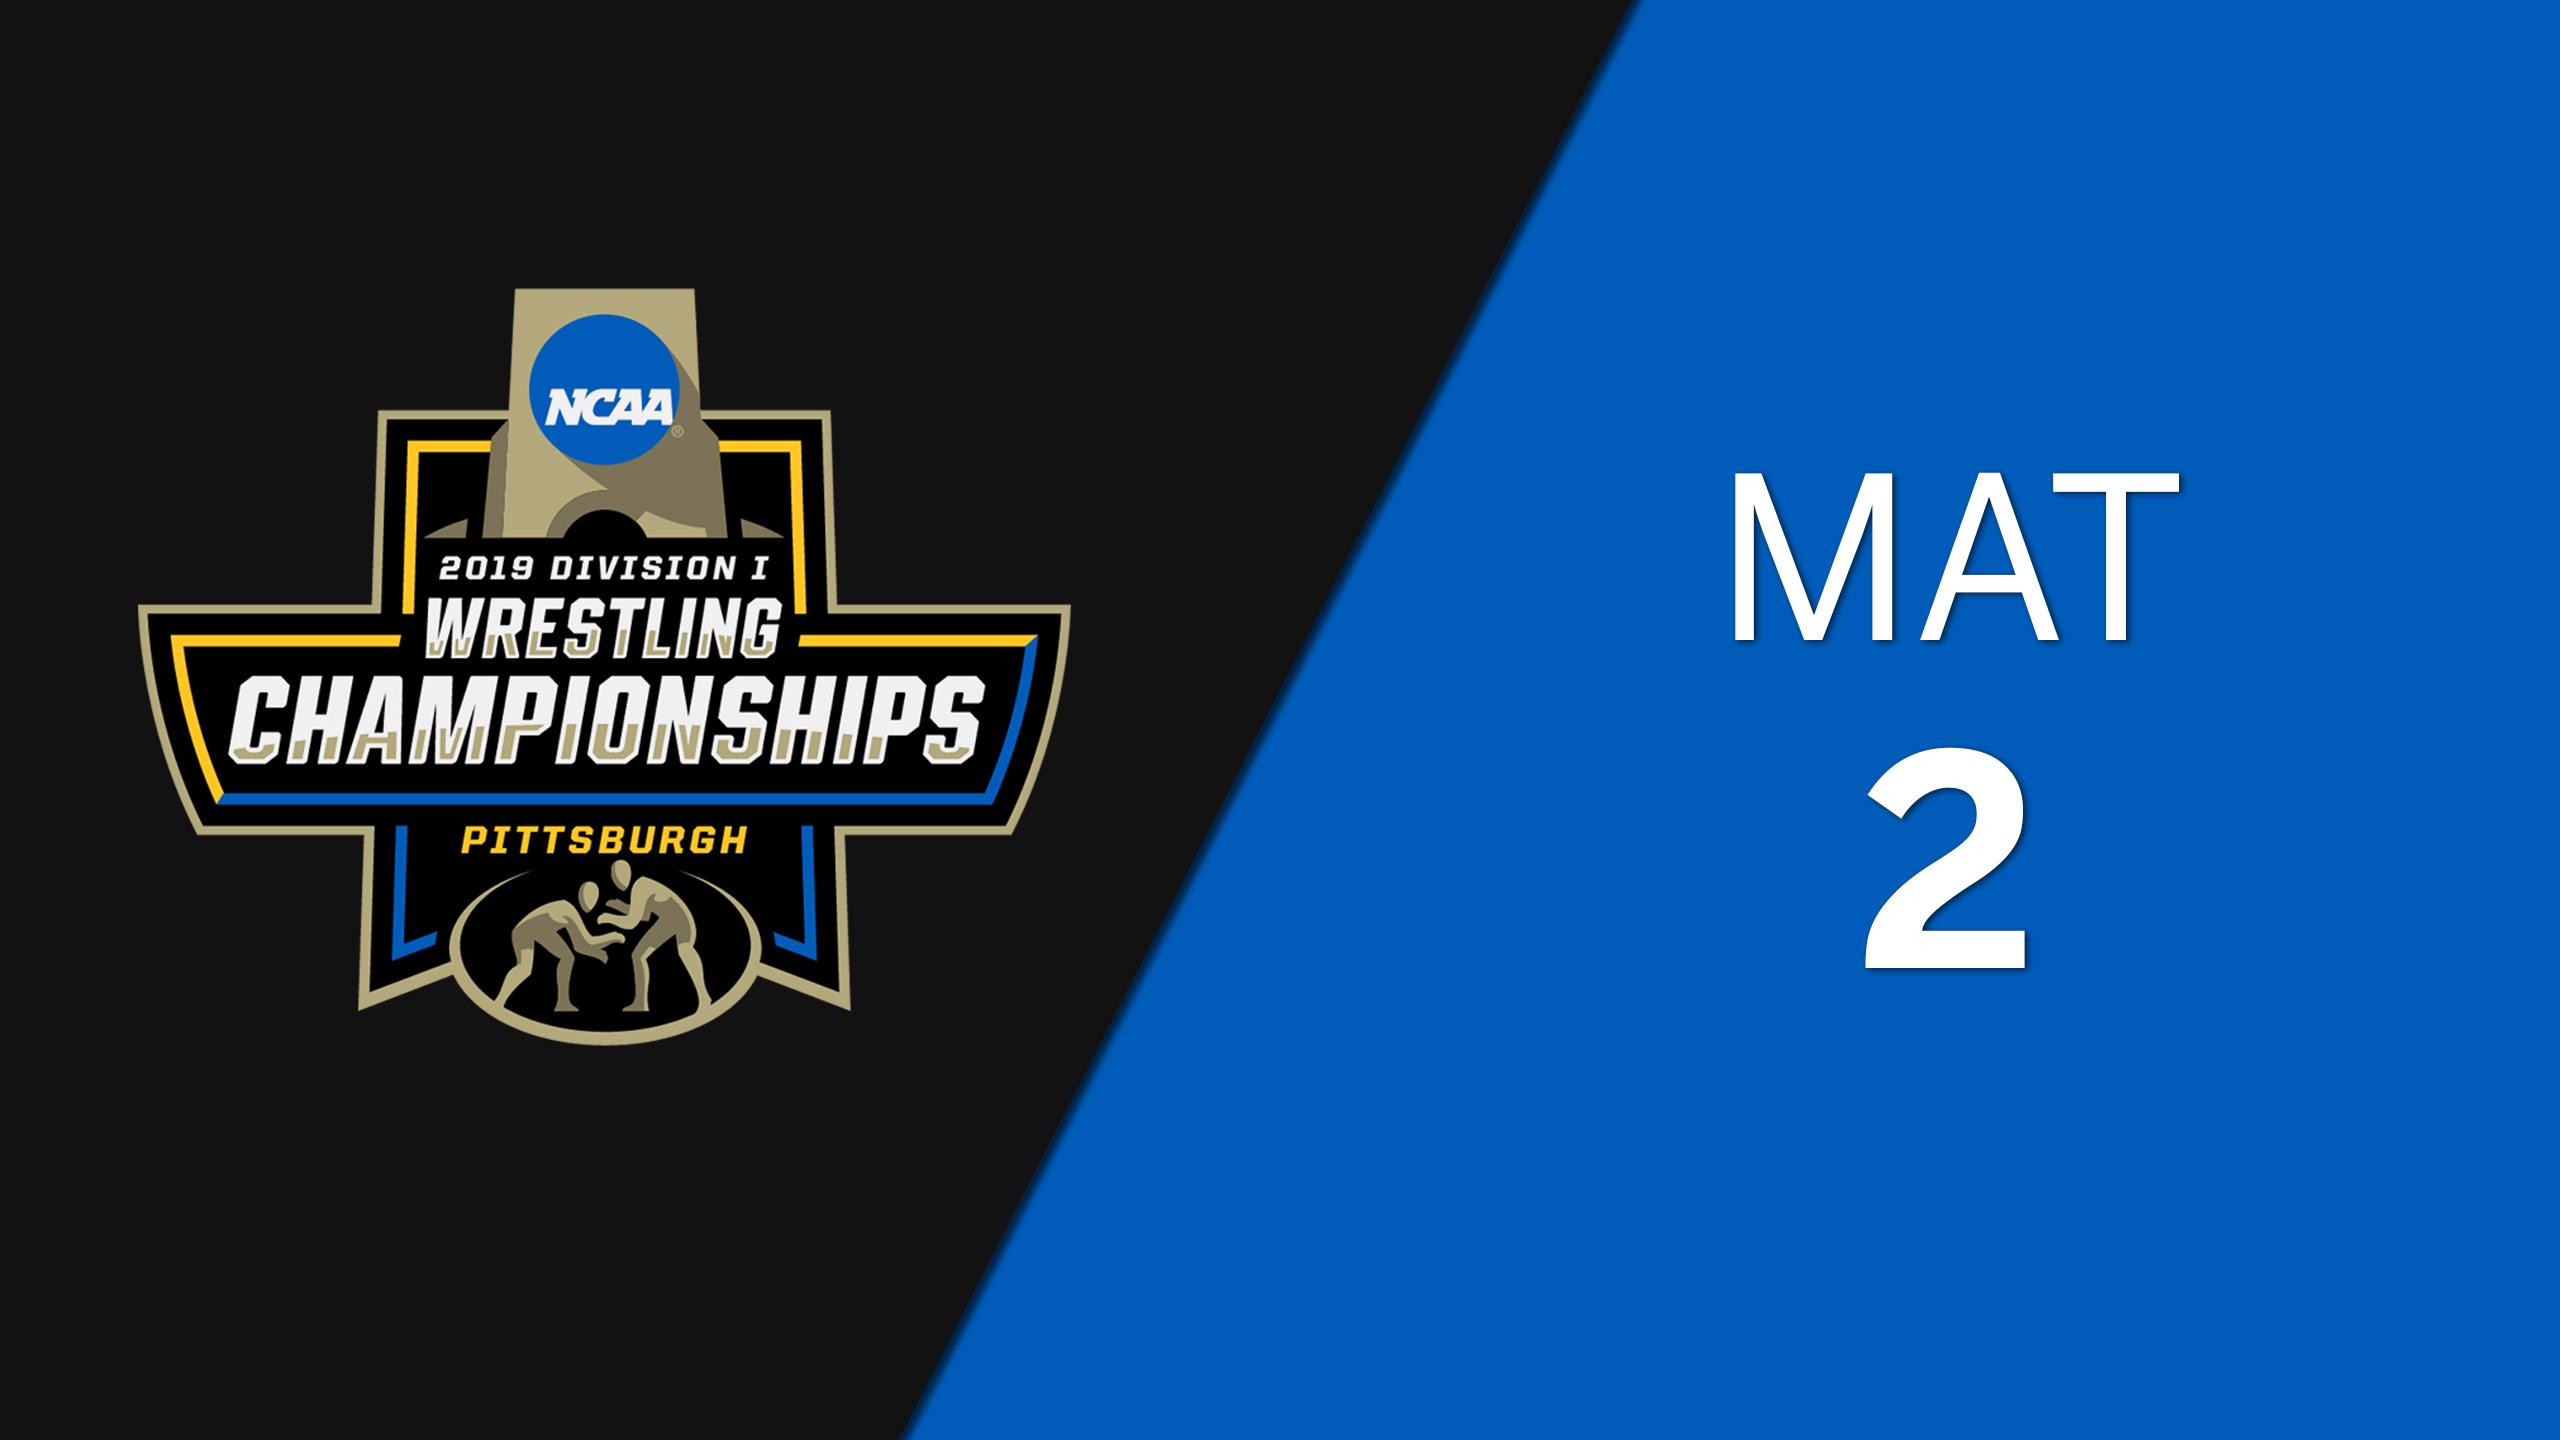 NCAA Wrestling Championship (Mat 2, Quarterfinals)